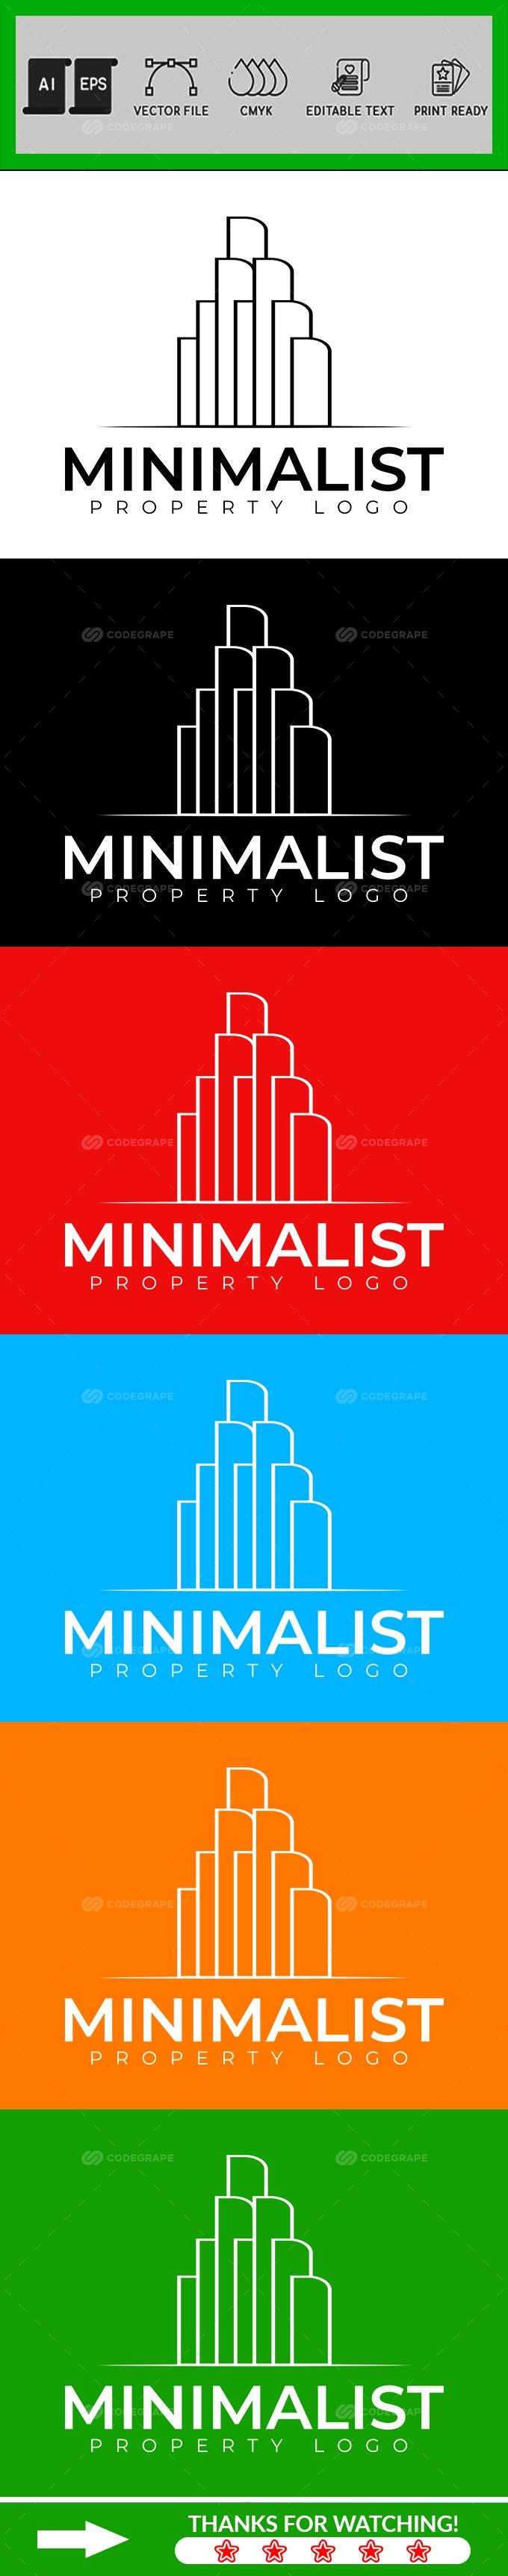 Minimalist Property Real Estate Logo Design Template